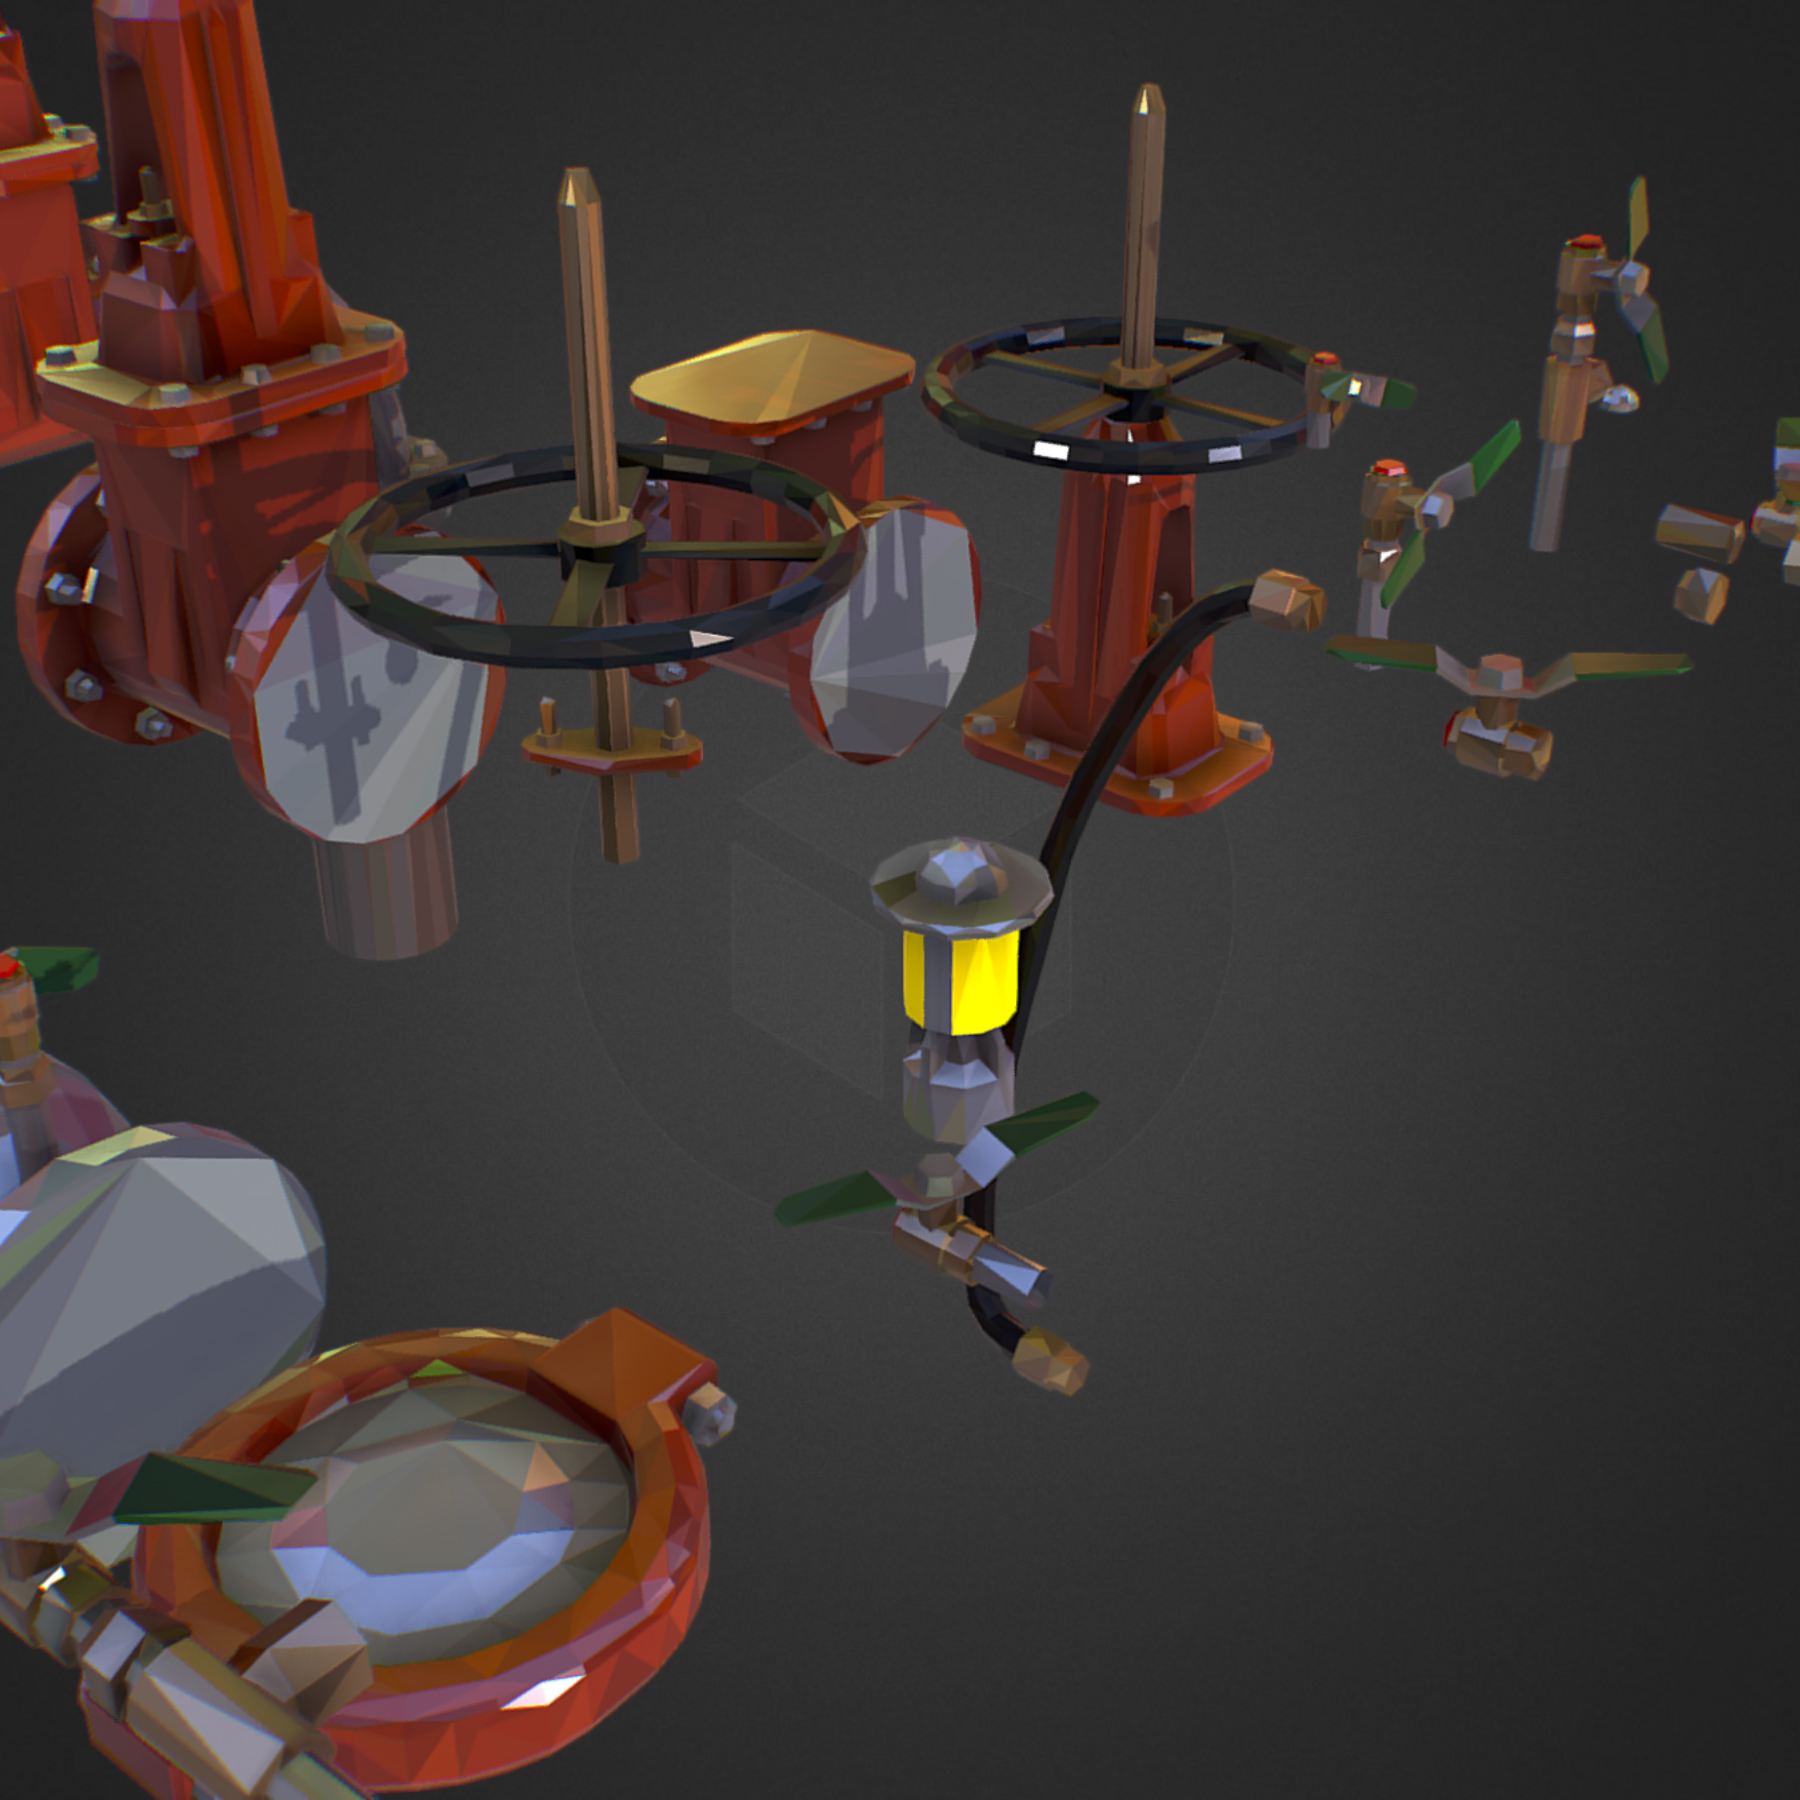 Low Poly ART Backflow Water Pipe Constructor 3d model max 3ds max plugin fbx ma mb tga targa icb vda vst pix obj 272549